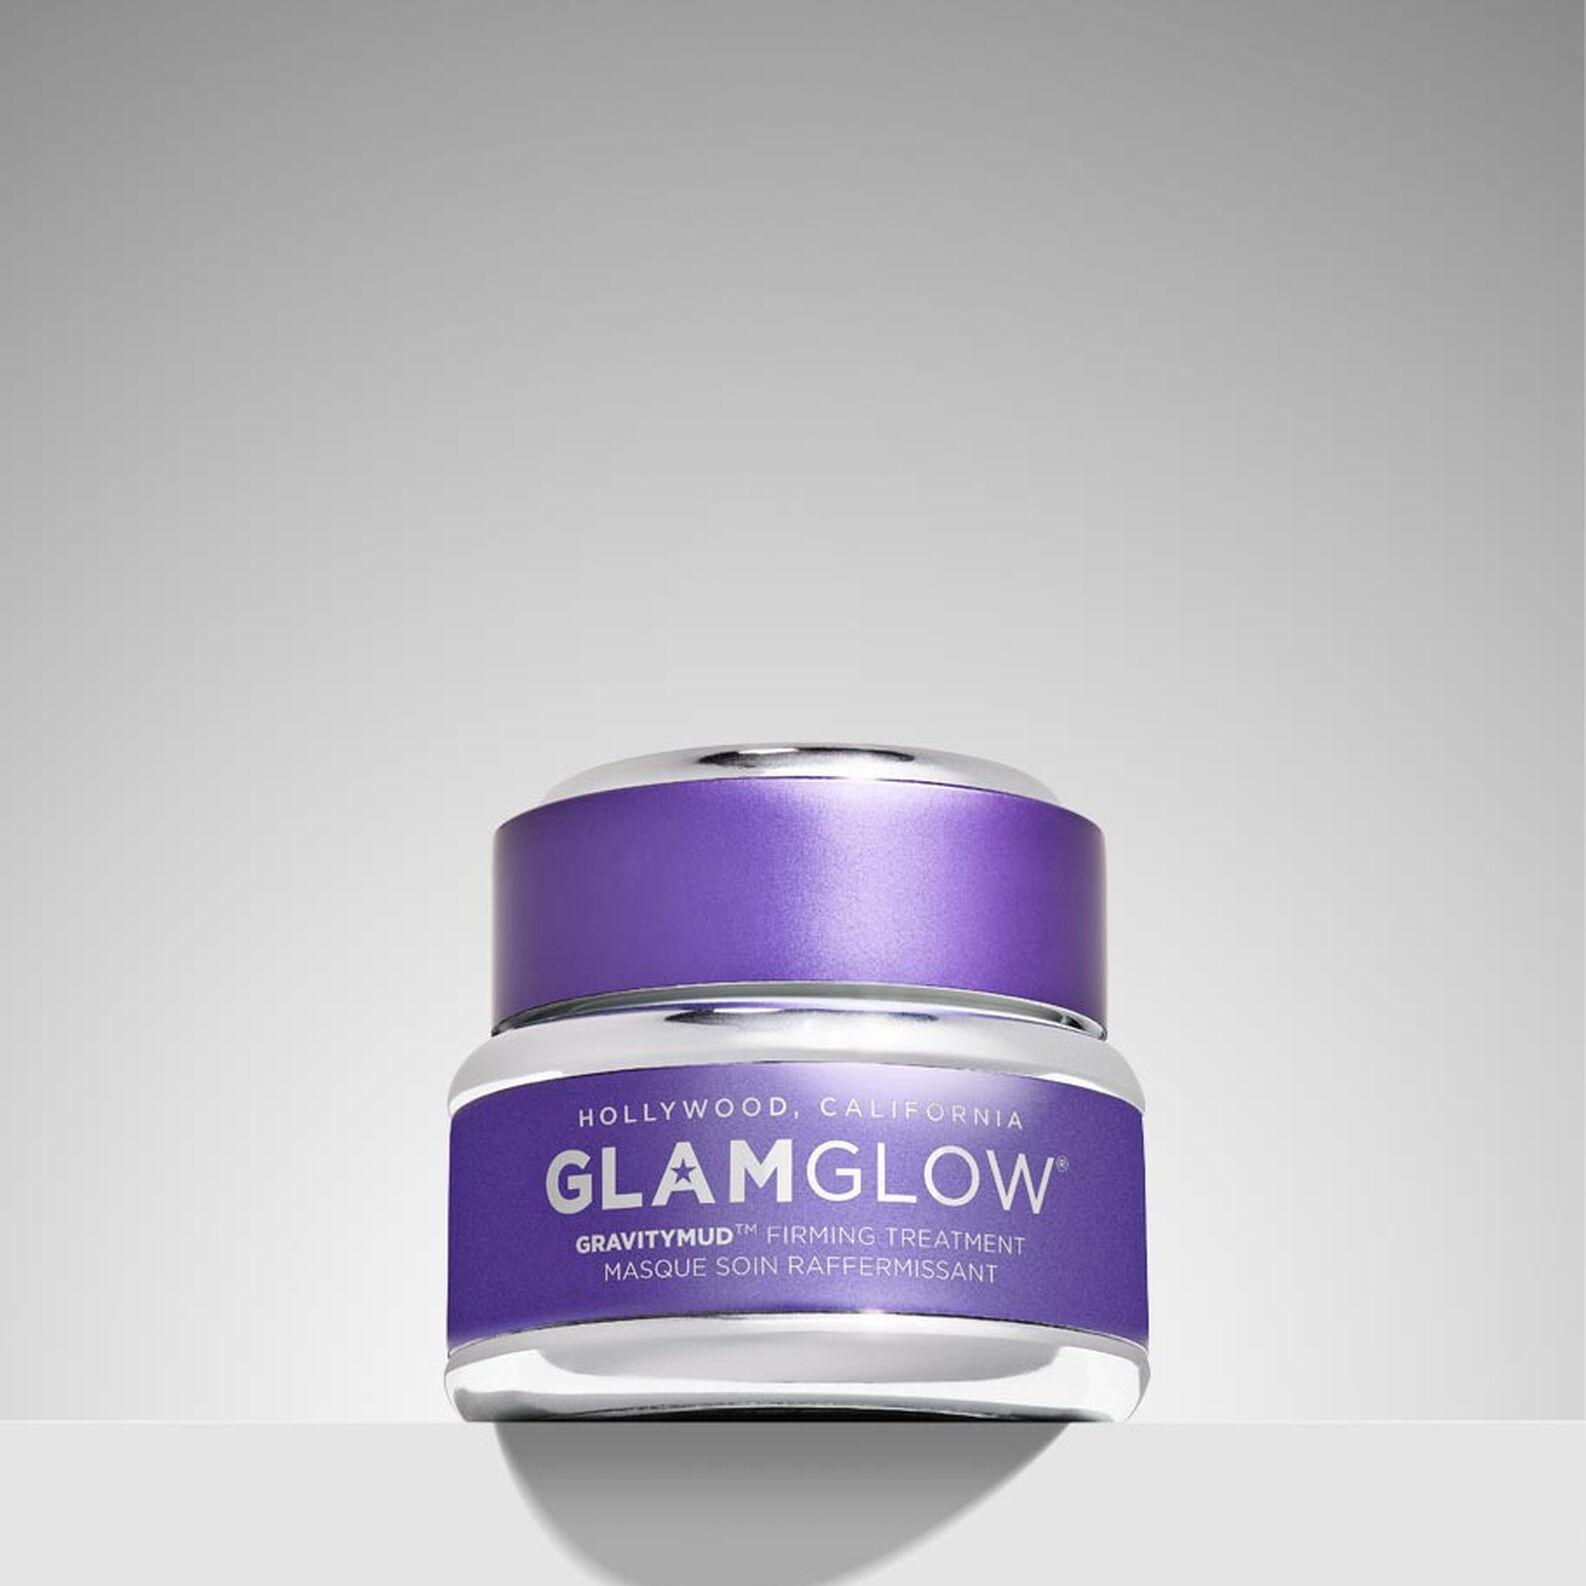 Glamglow gravitymud - firming treatment 15 gr